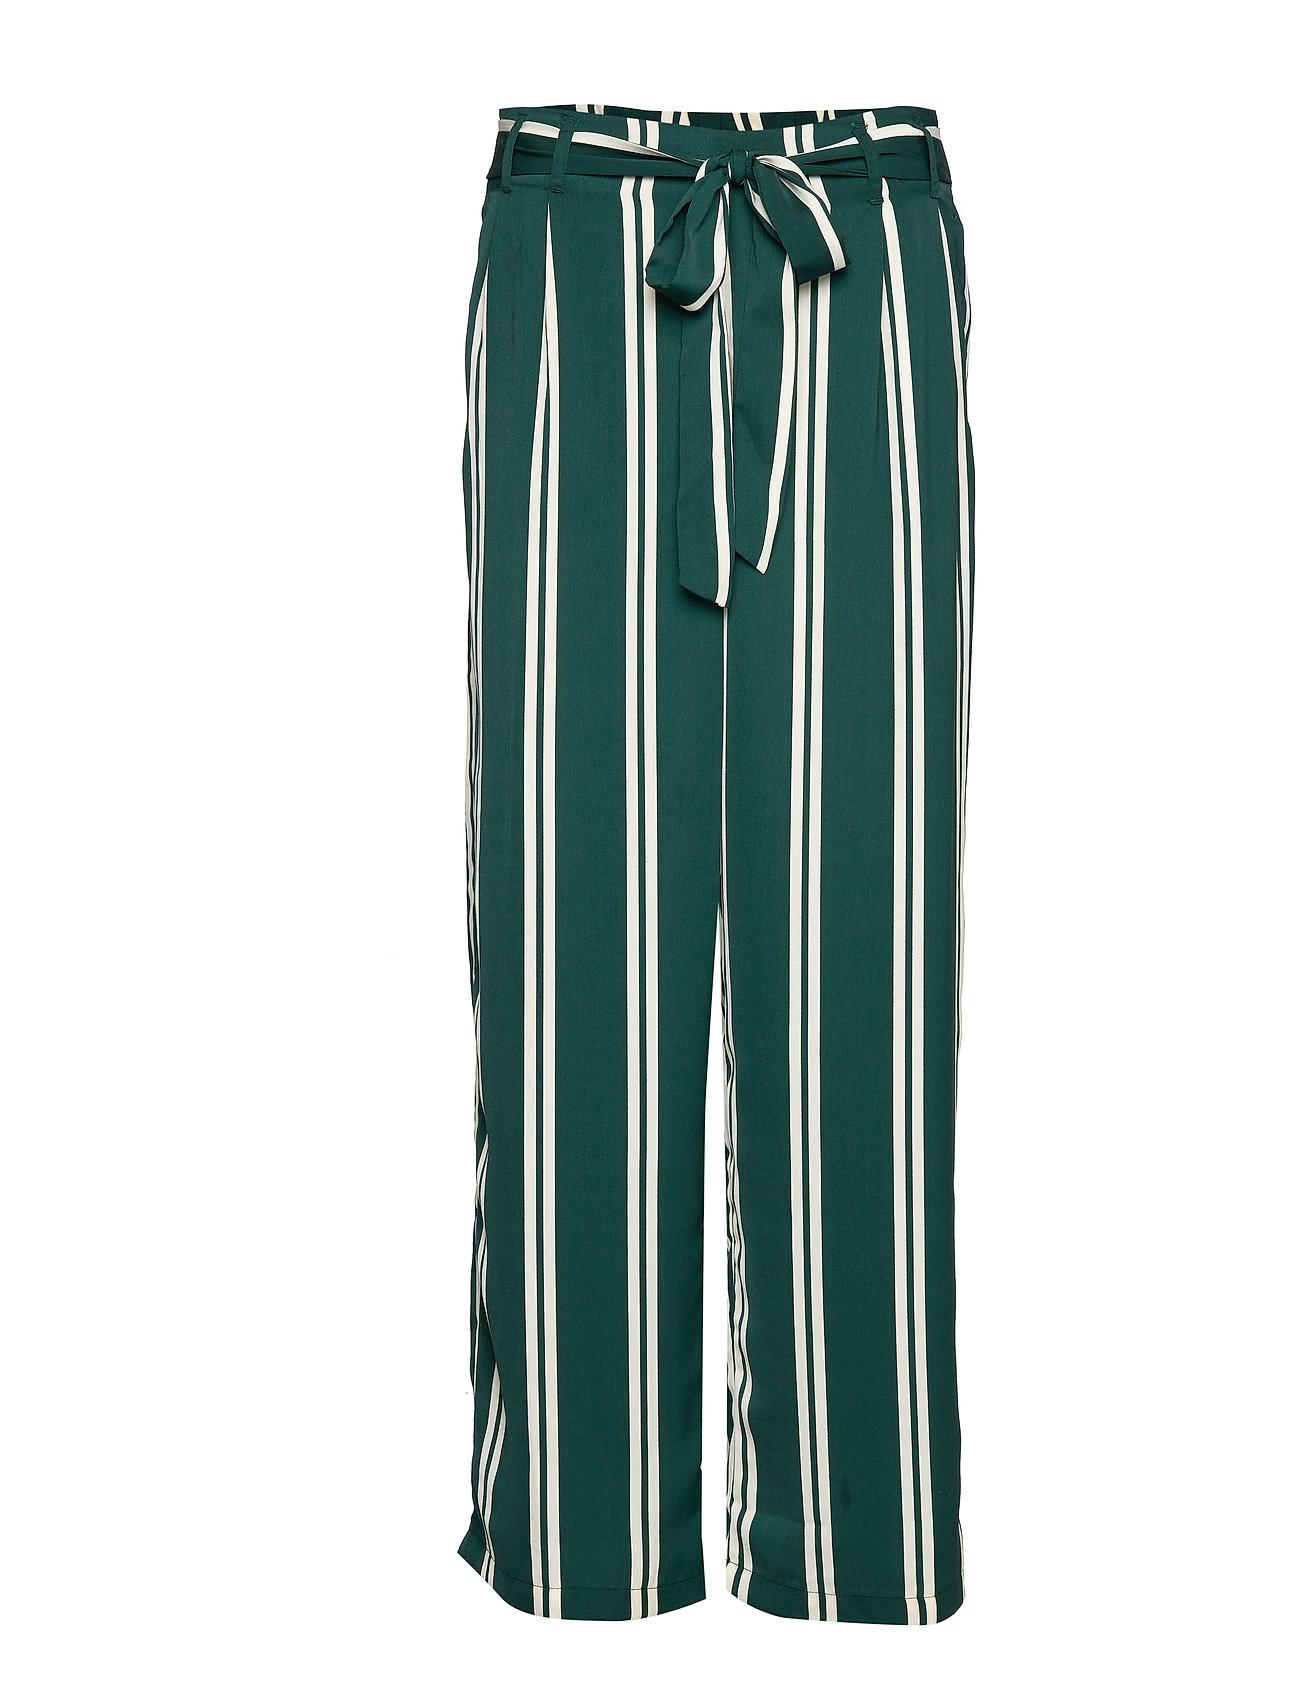 Lollys Laundry Aila Pants (Stripe), 350